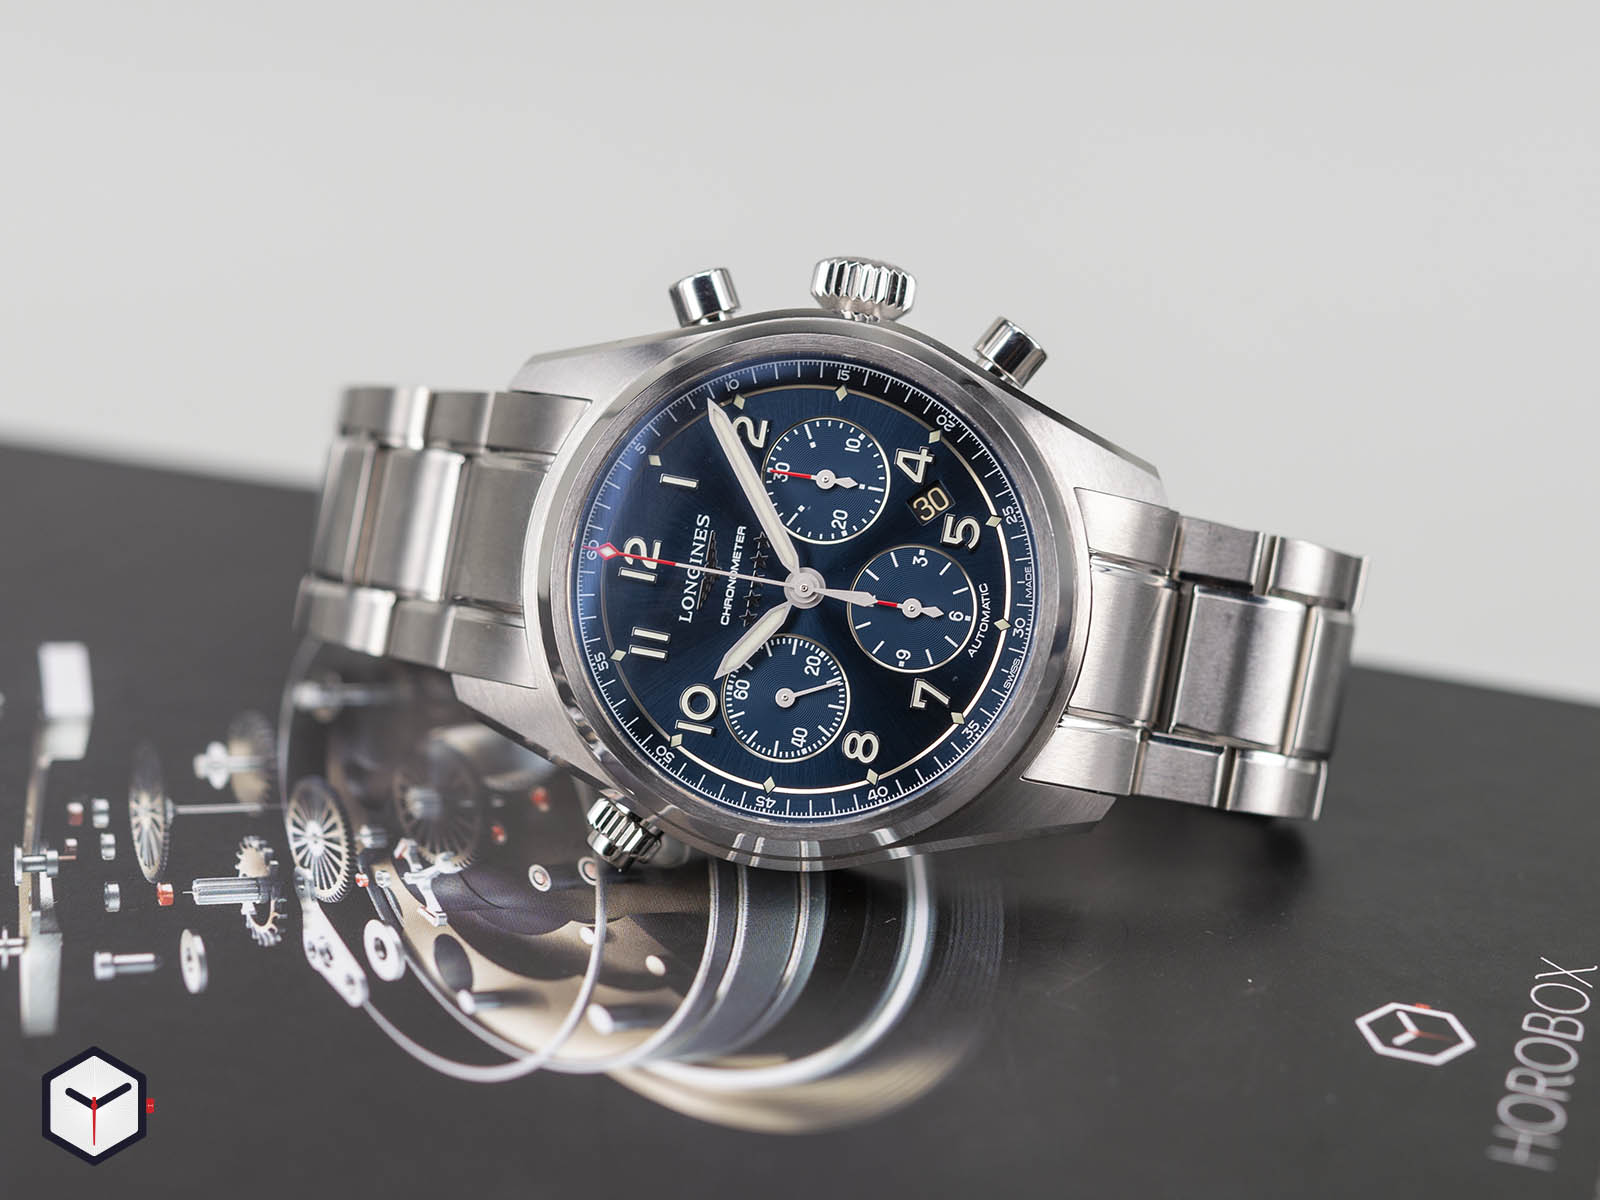 l3-820-4-93-6-longines-spirit-chronograph-collection-2.jpg